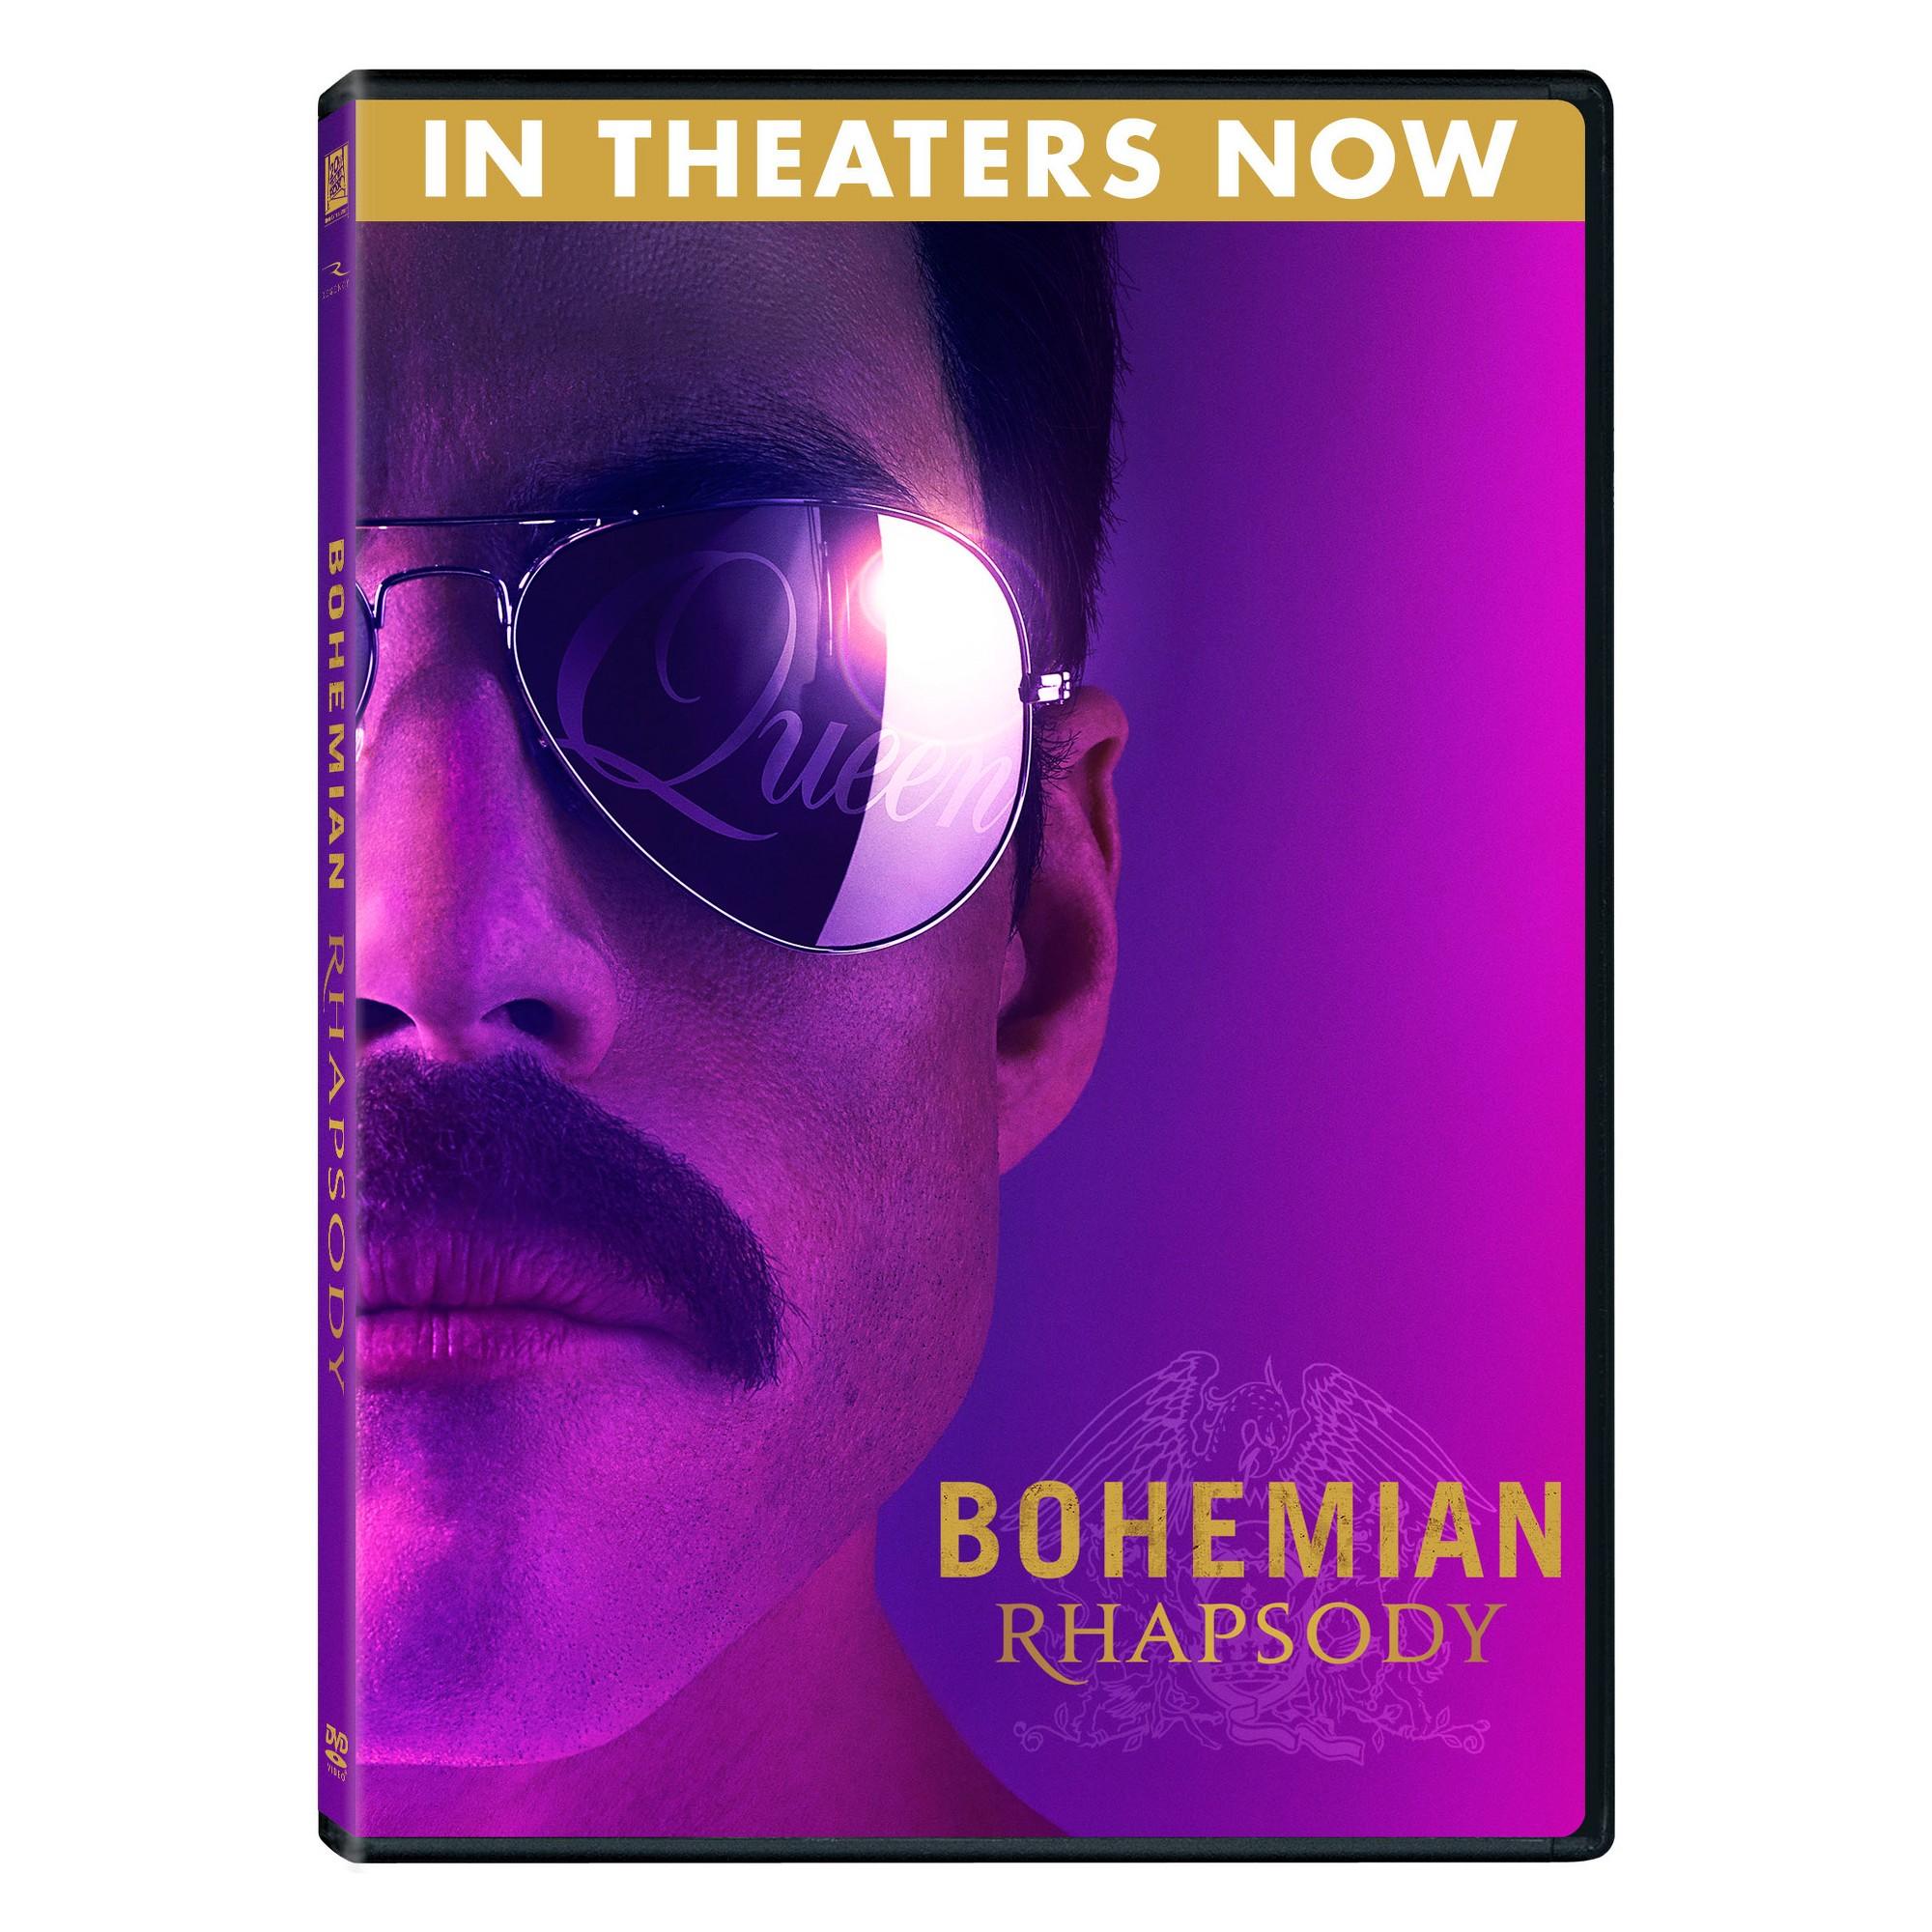 Bohemian Rhapsody Dvd Movies Products Pinterest Bohemian